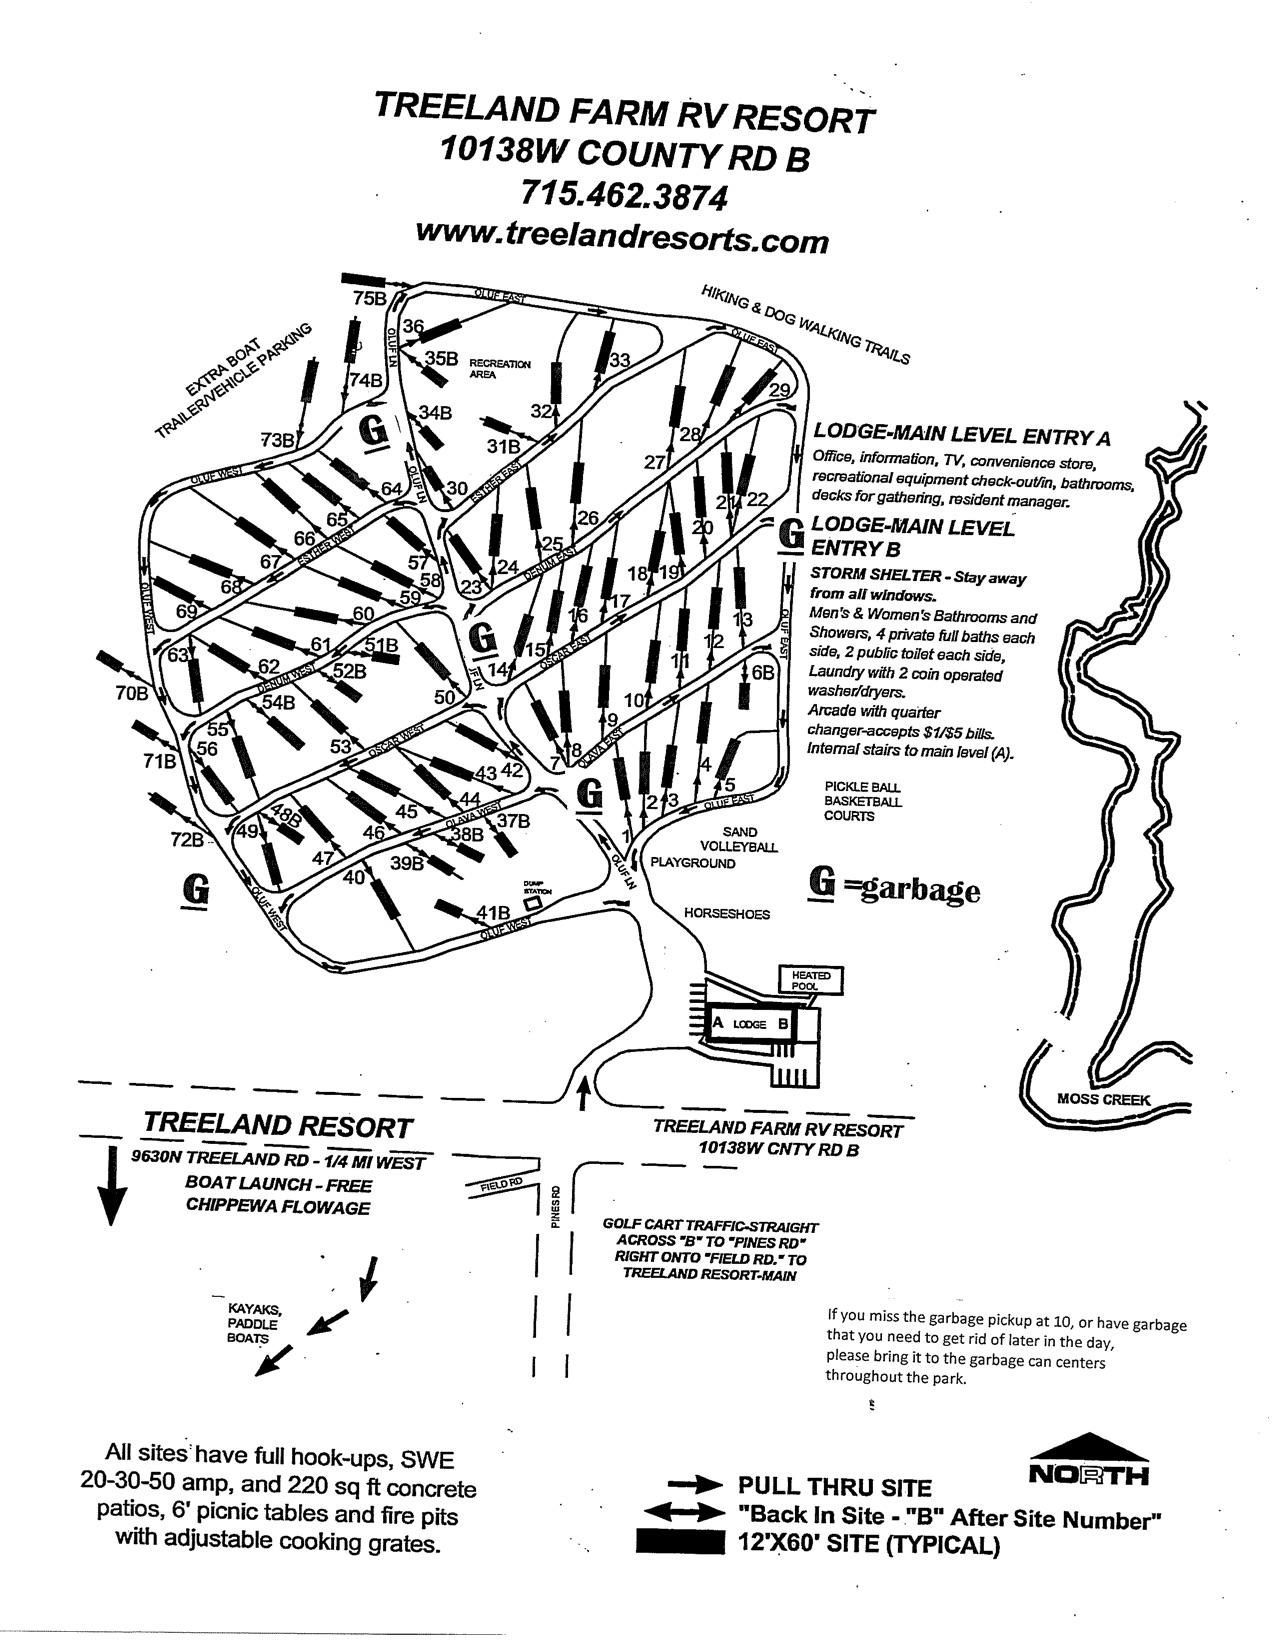 Hayward WI RV Park Map - Treeland Resorts